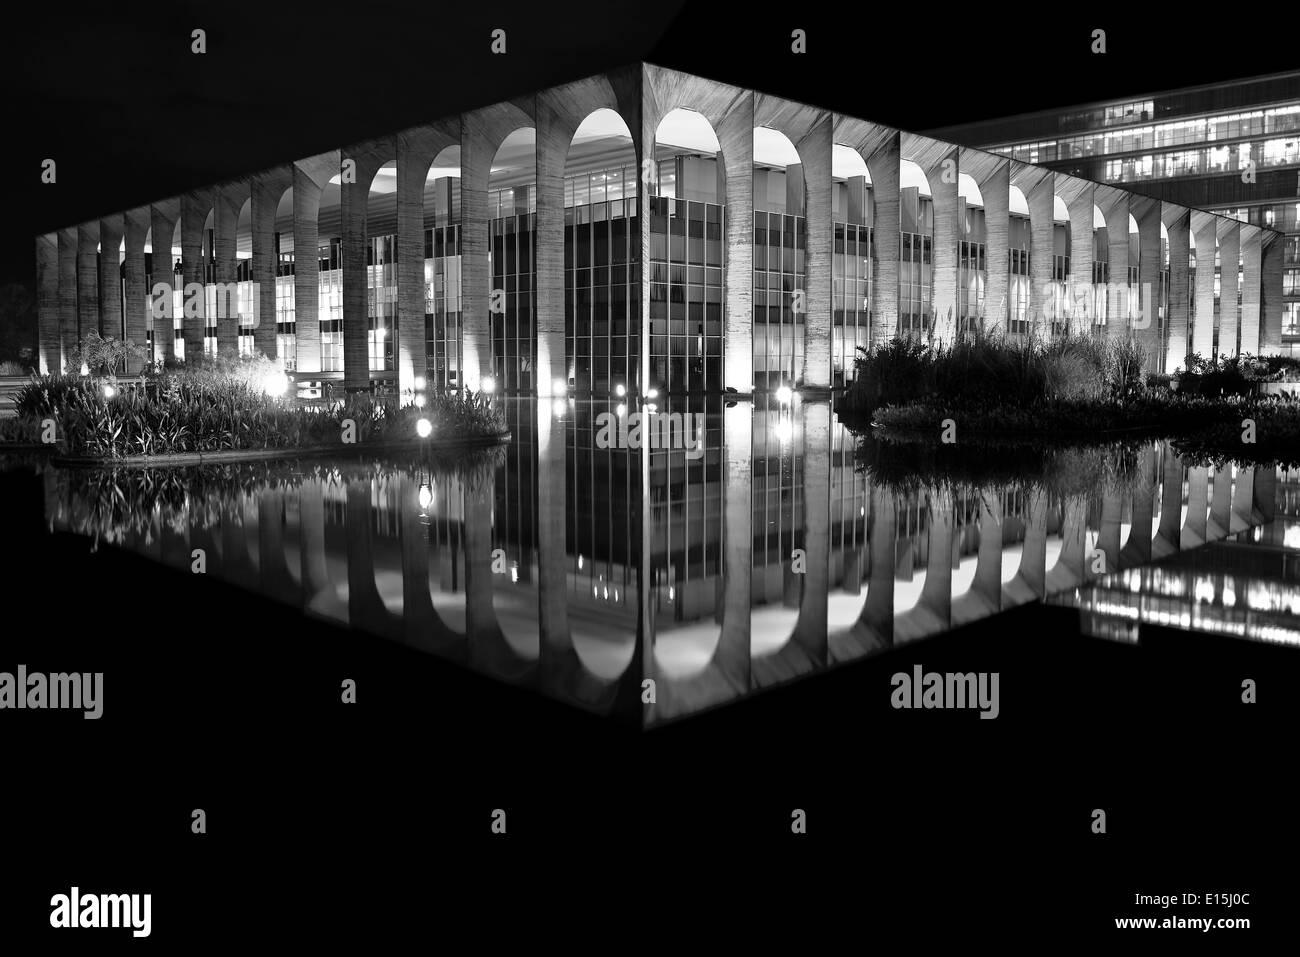 Brazil, Brasilia: Itamaraty Palace in black and white version - Stock Image